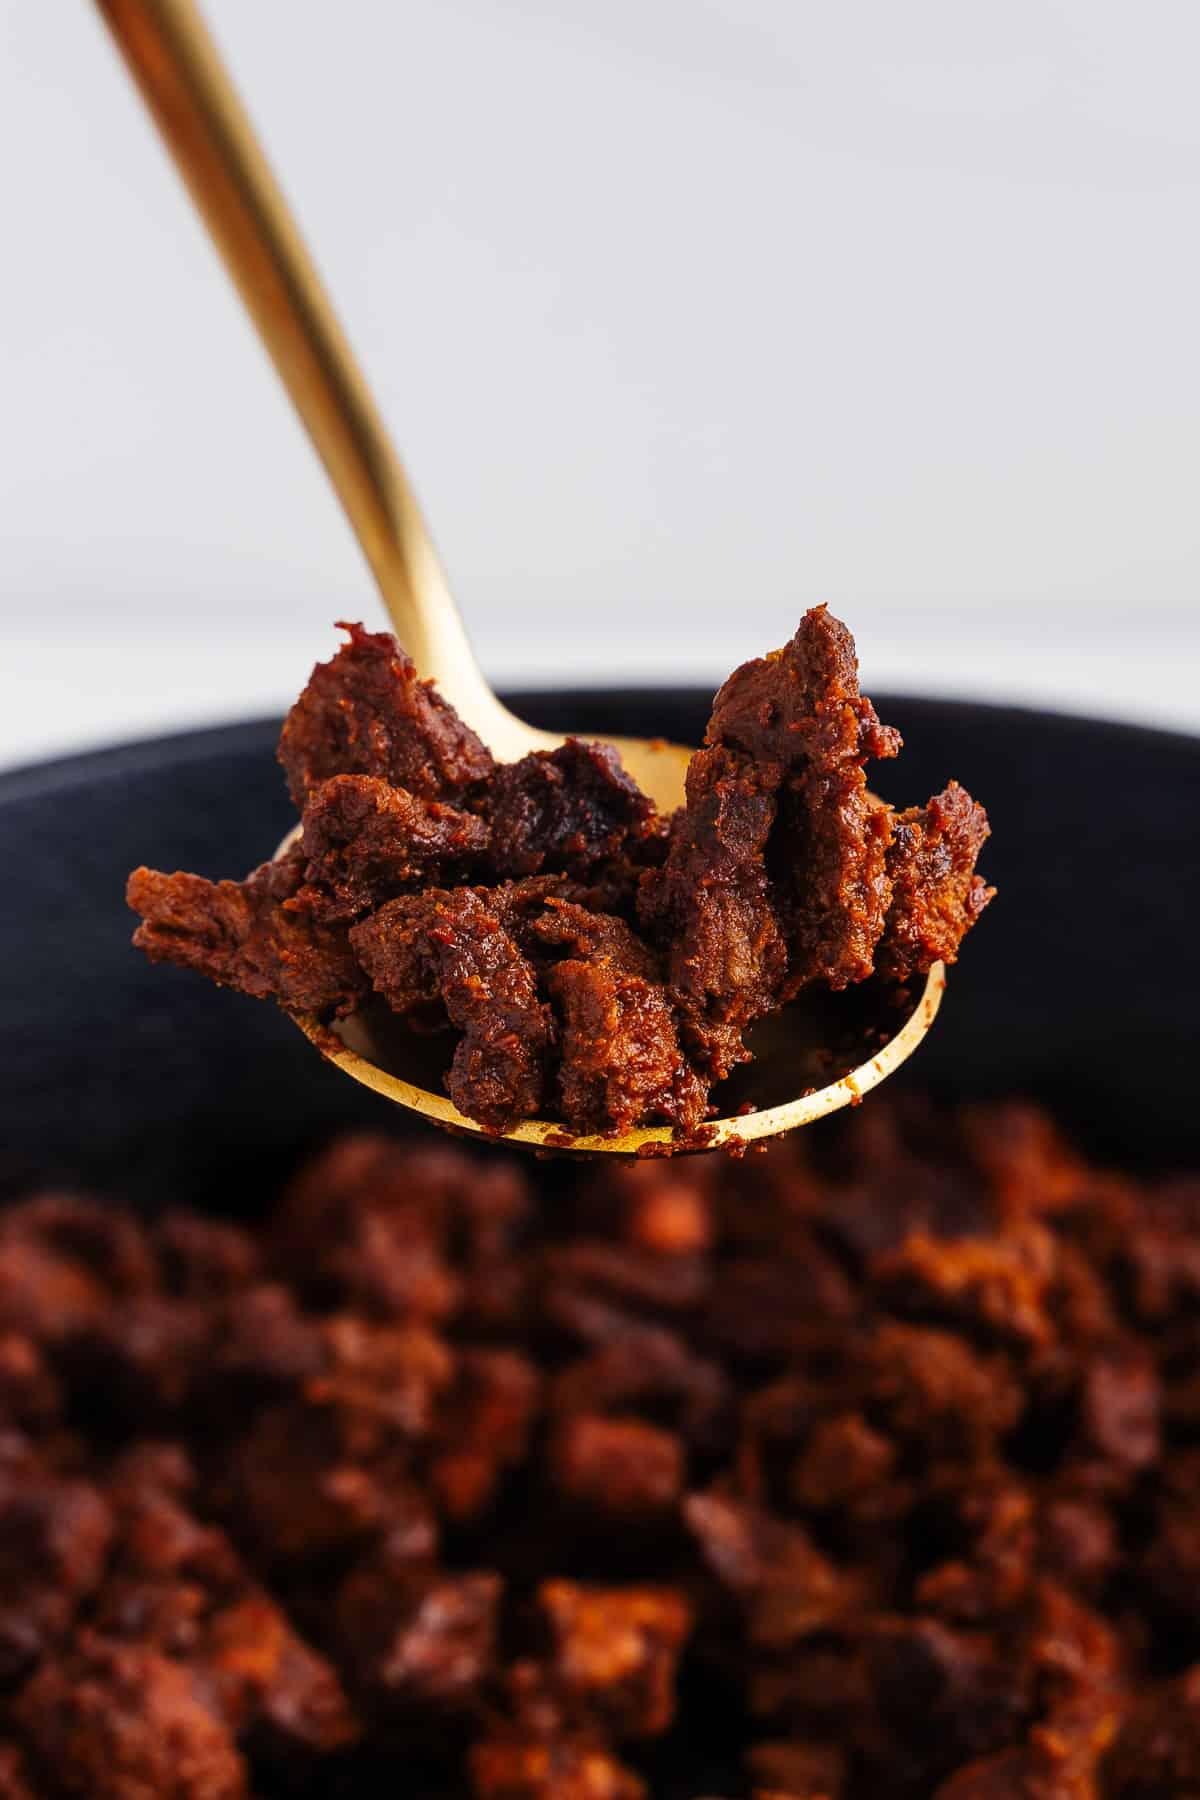 Vegan Chorizo on a Spoon